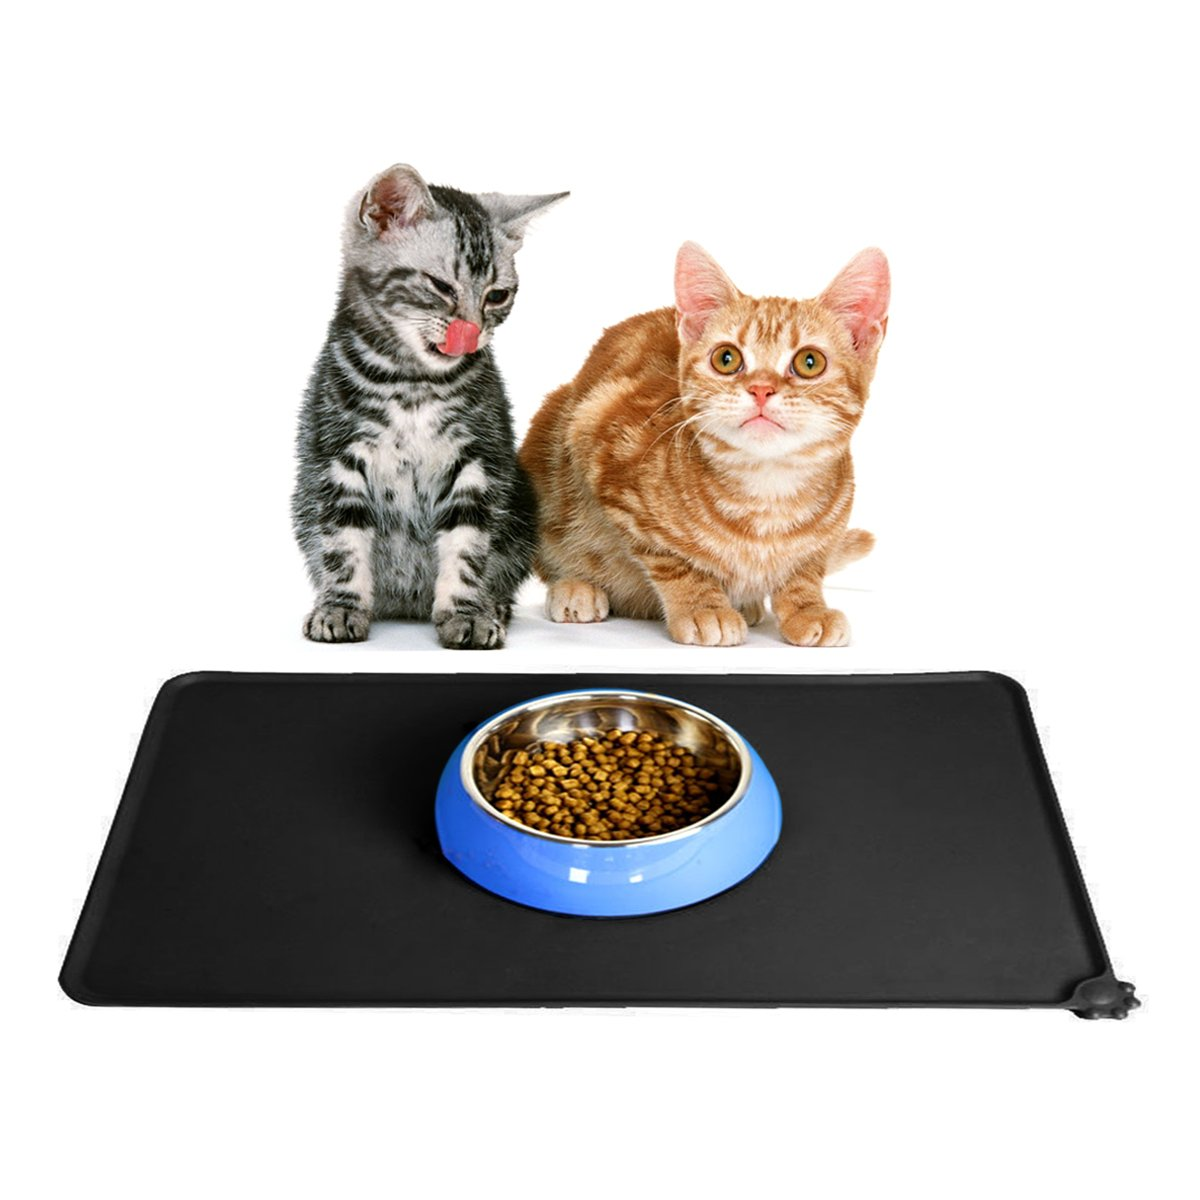 Alfombrilla para alimentos para mascotas, Aodoor FDA Alimentación de grado de silicona para mascotas de alimentación, Negro(47*30)